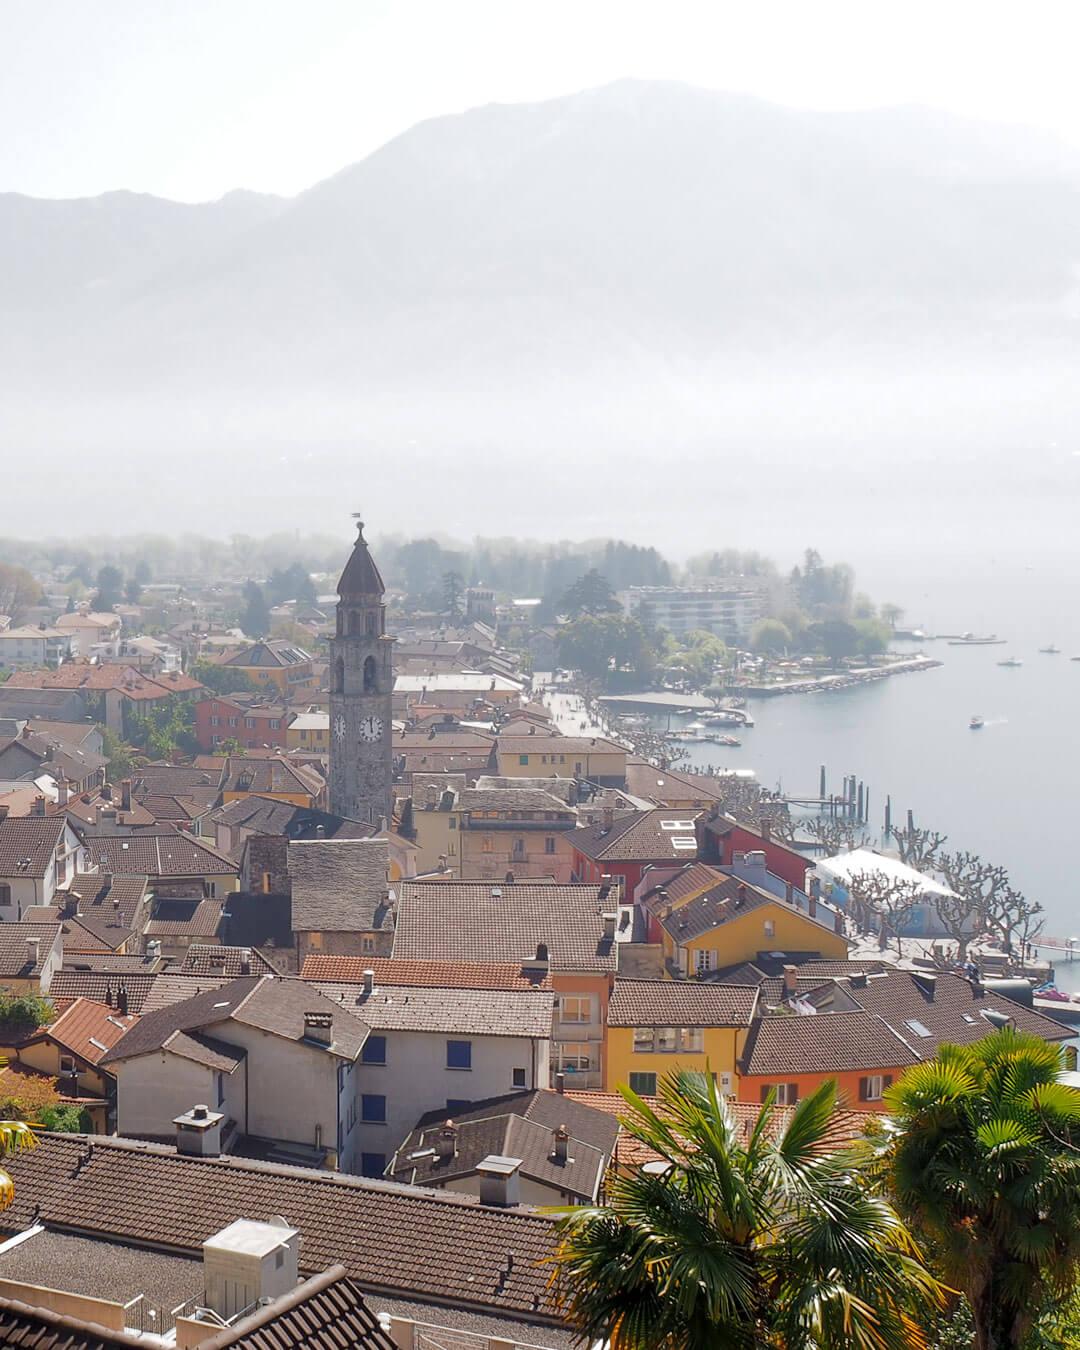 Ascona in Switzerland